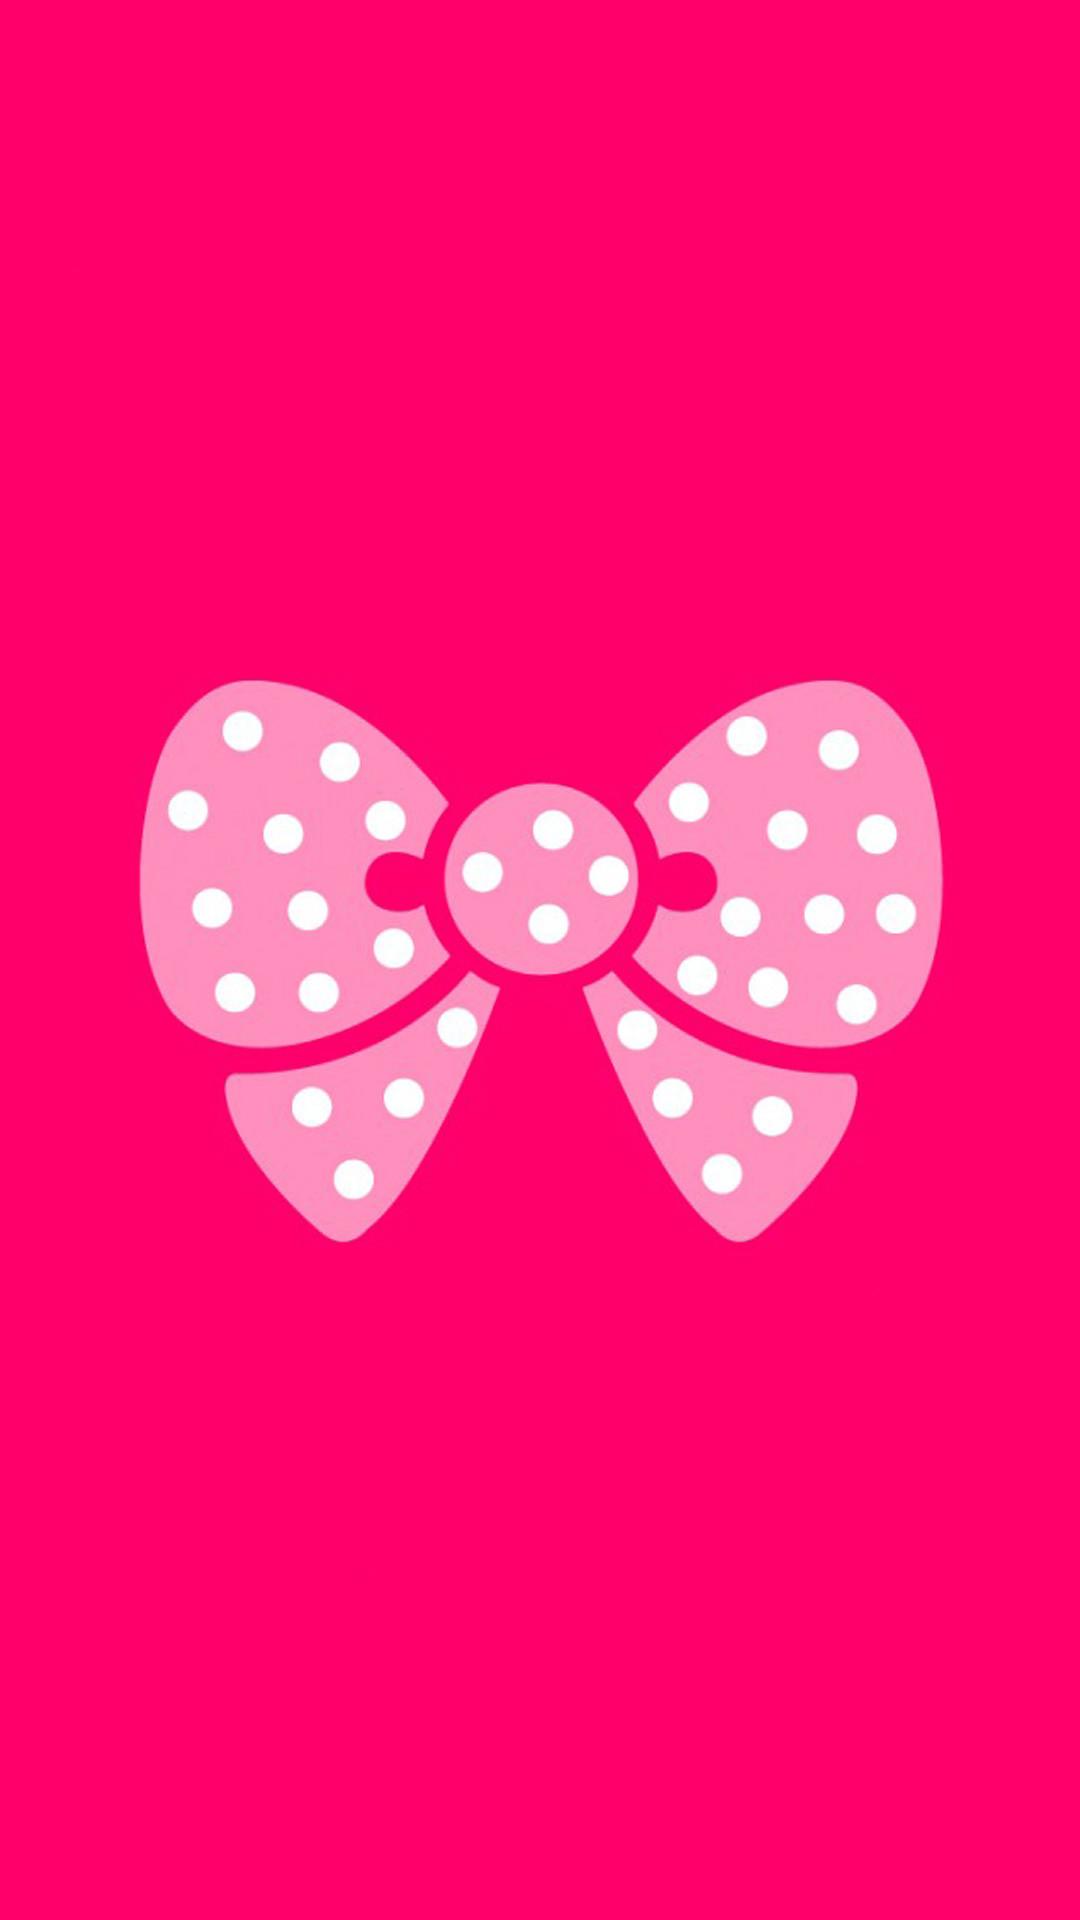 Wallpaper iphone cute blue – Iphone Wallpaper Tumblr Girl For Girls Pink  Ribbon Iphone Wallpaper Iphone